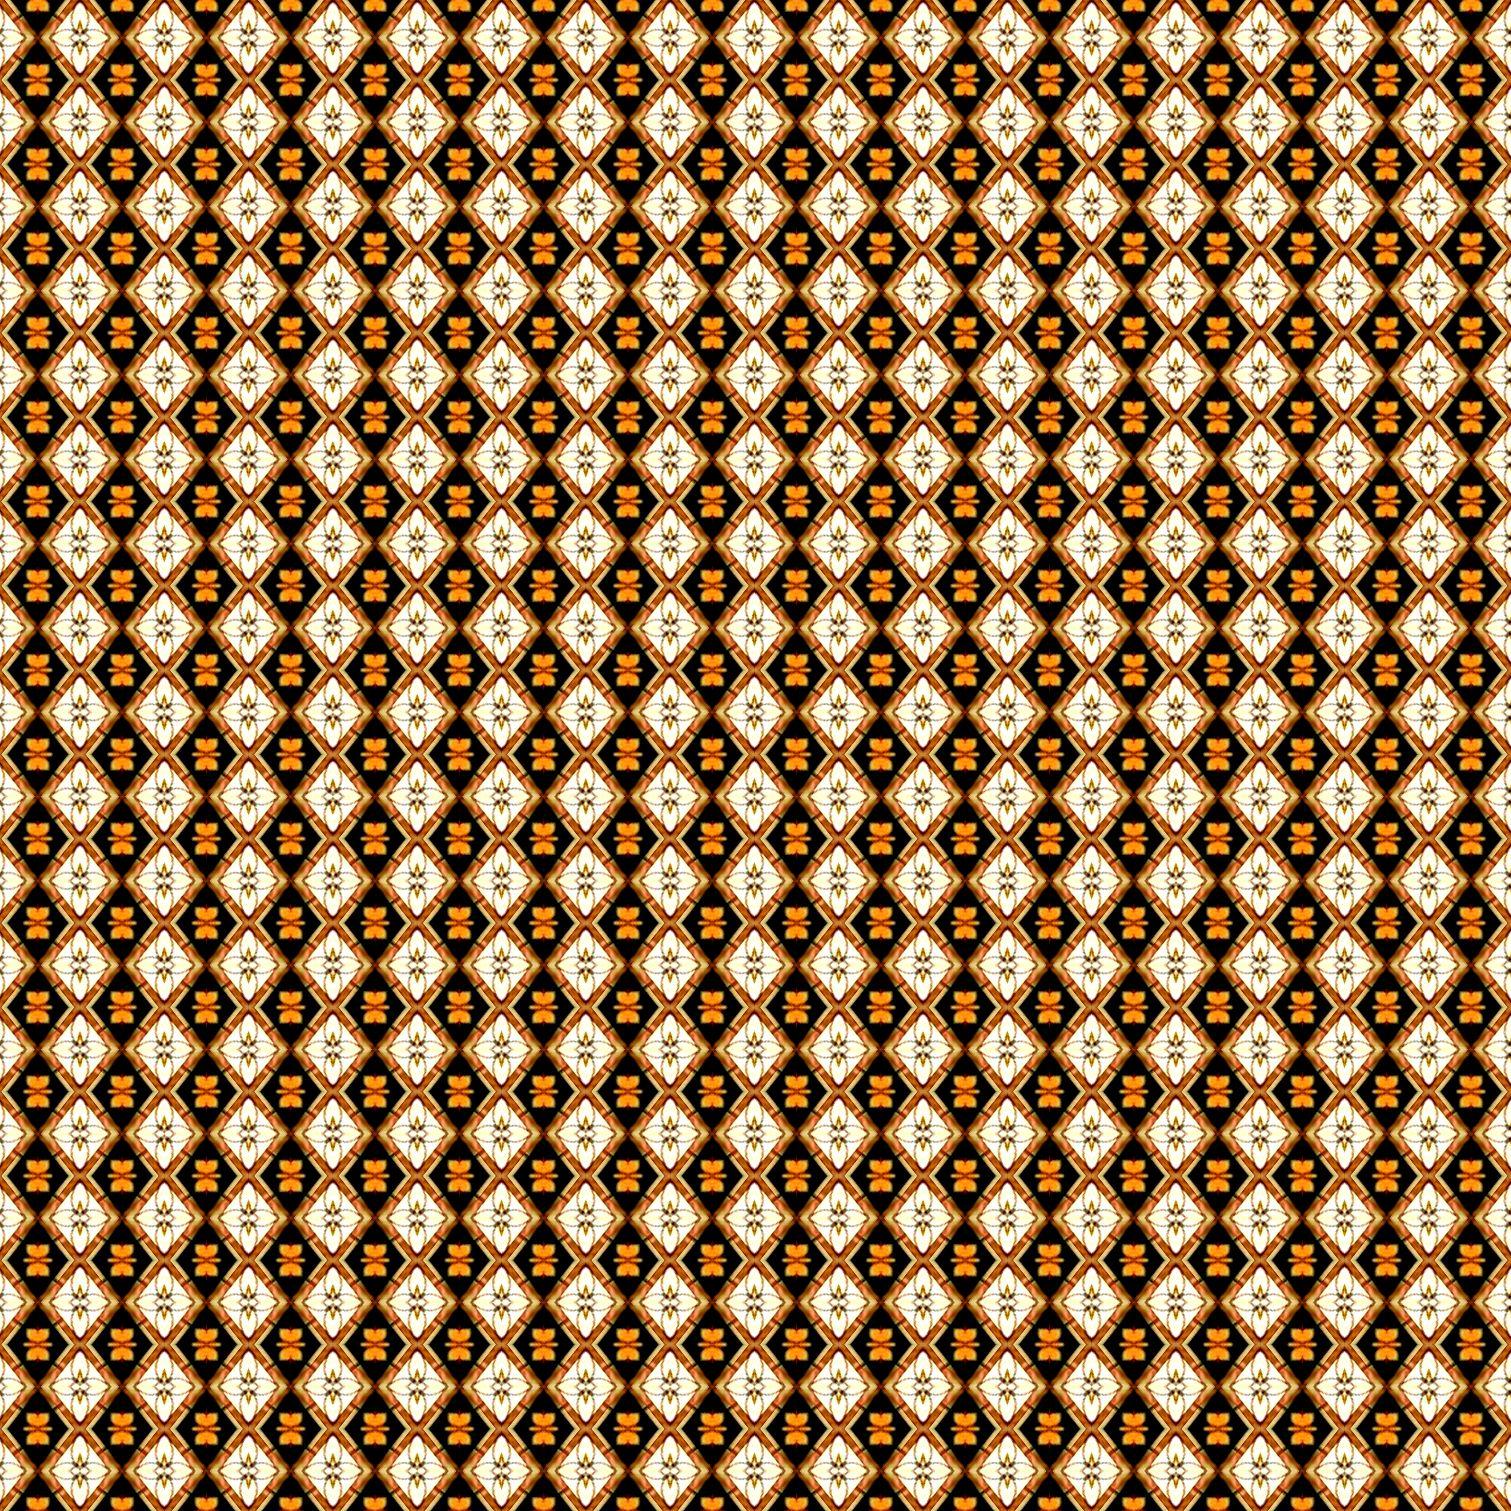 Tan Diamond Pattern 1 by janclark